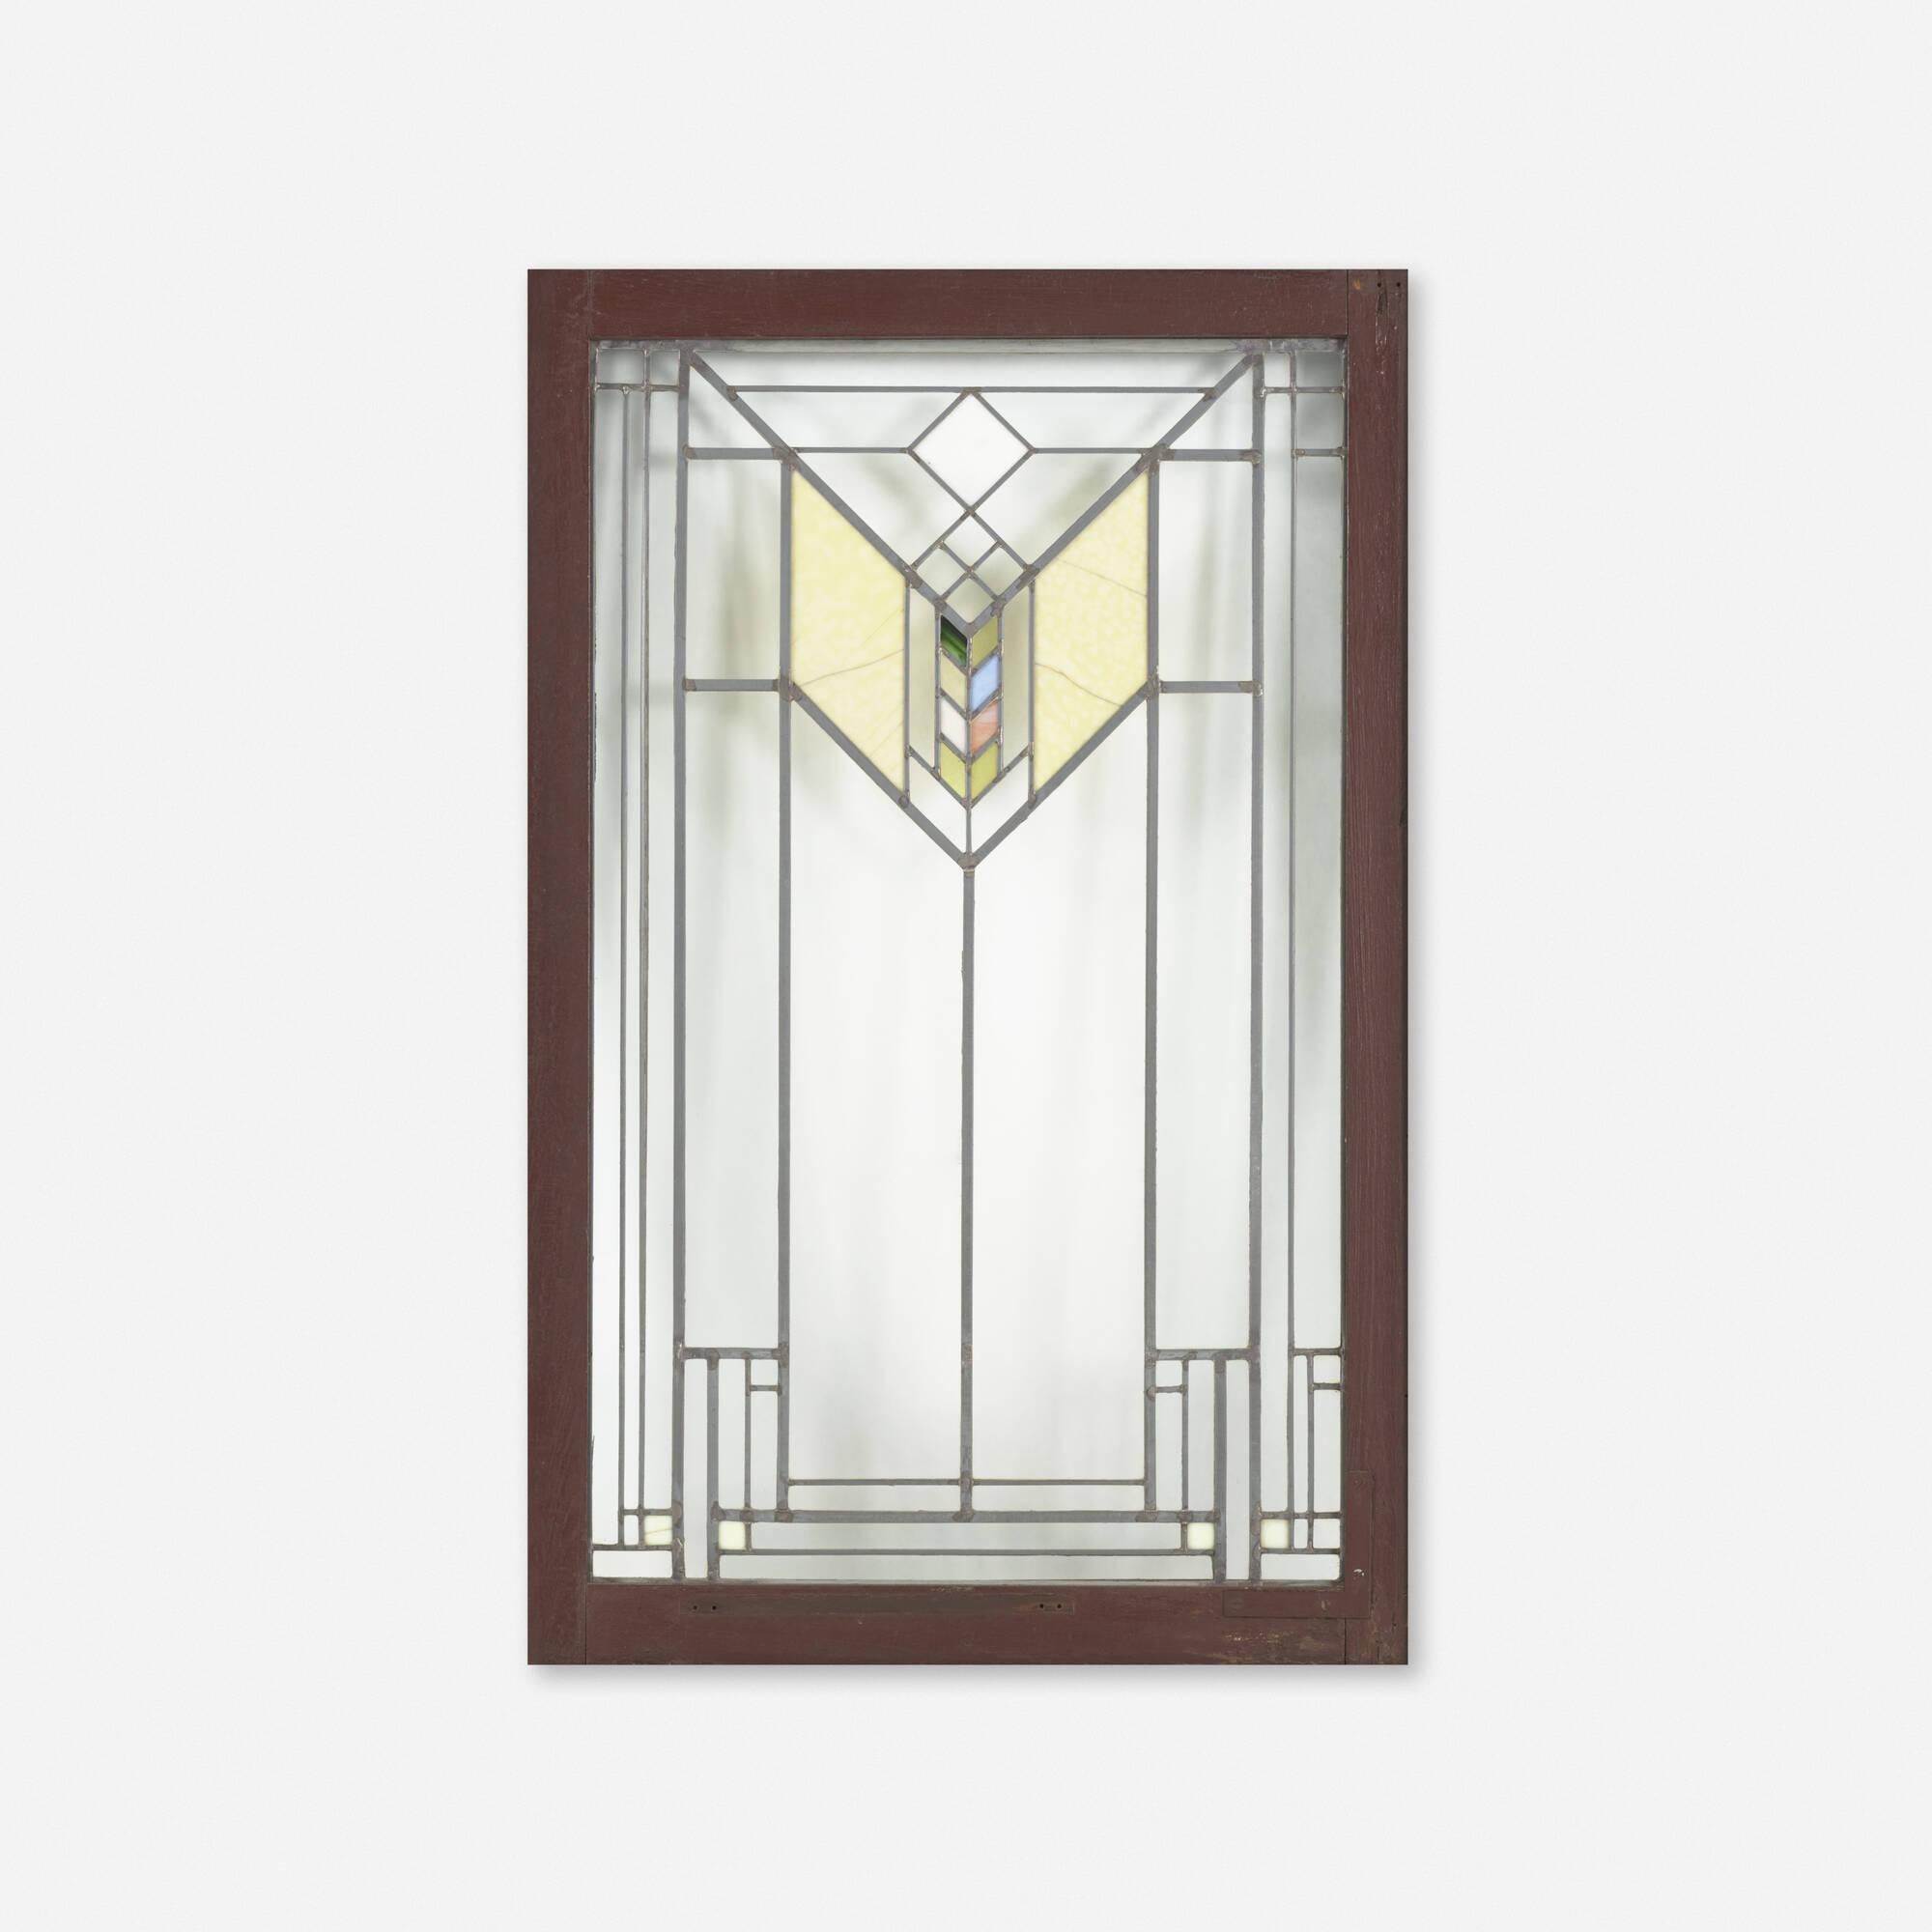 225 frank lloyd wright window from the lake geneva hotel for Design hotel f 6 genf